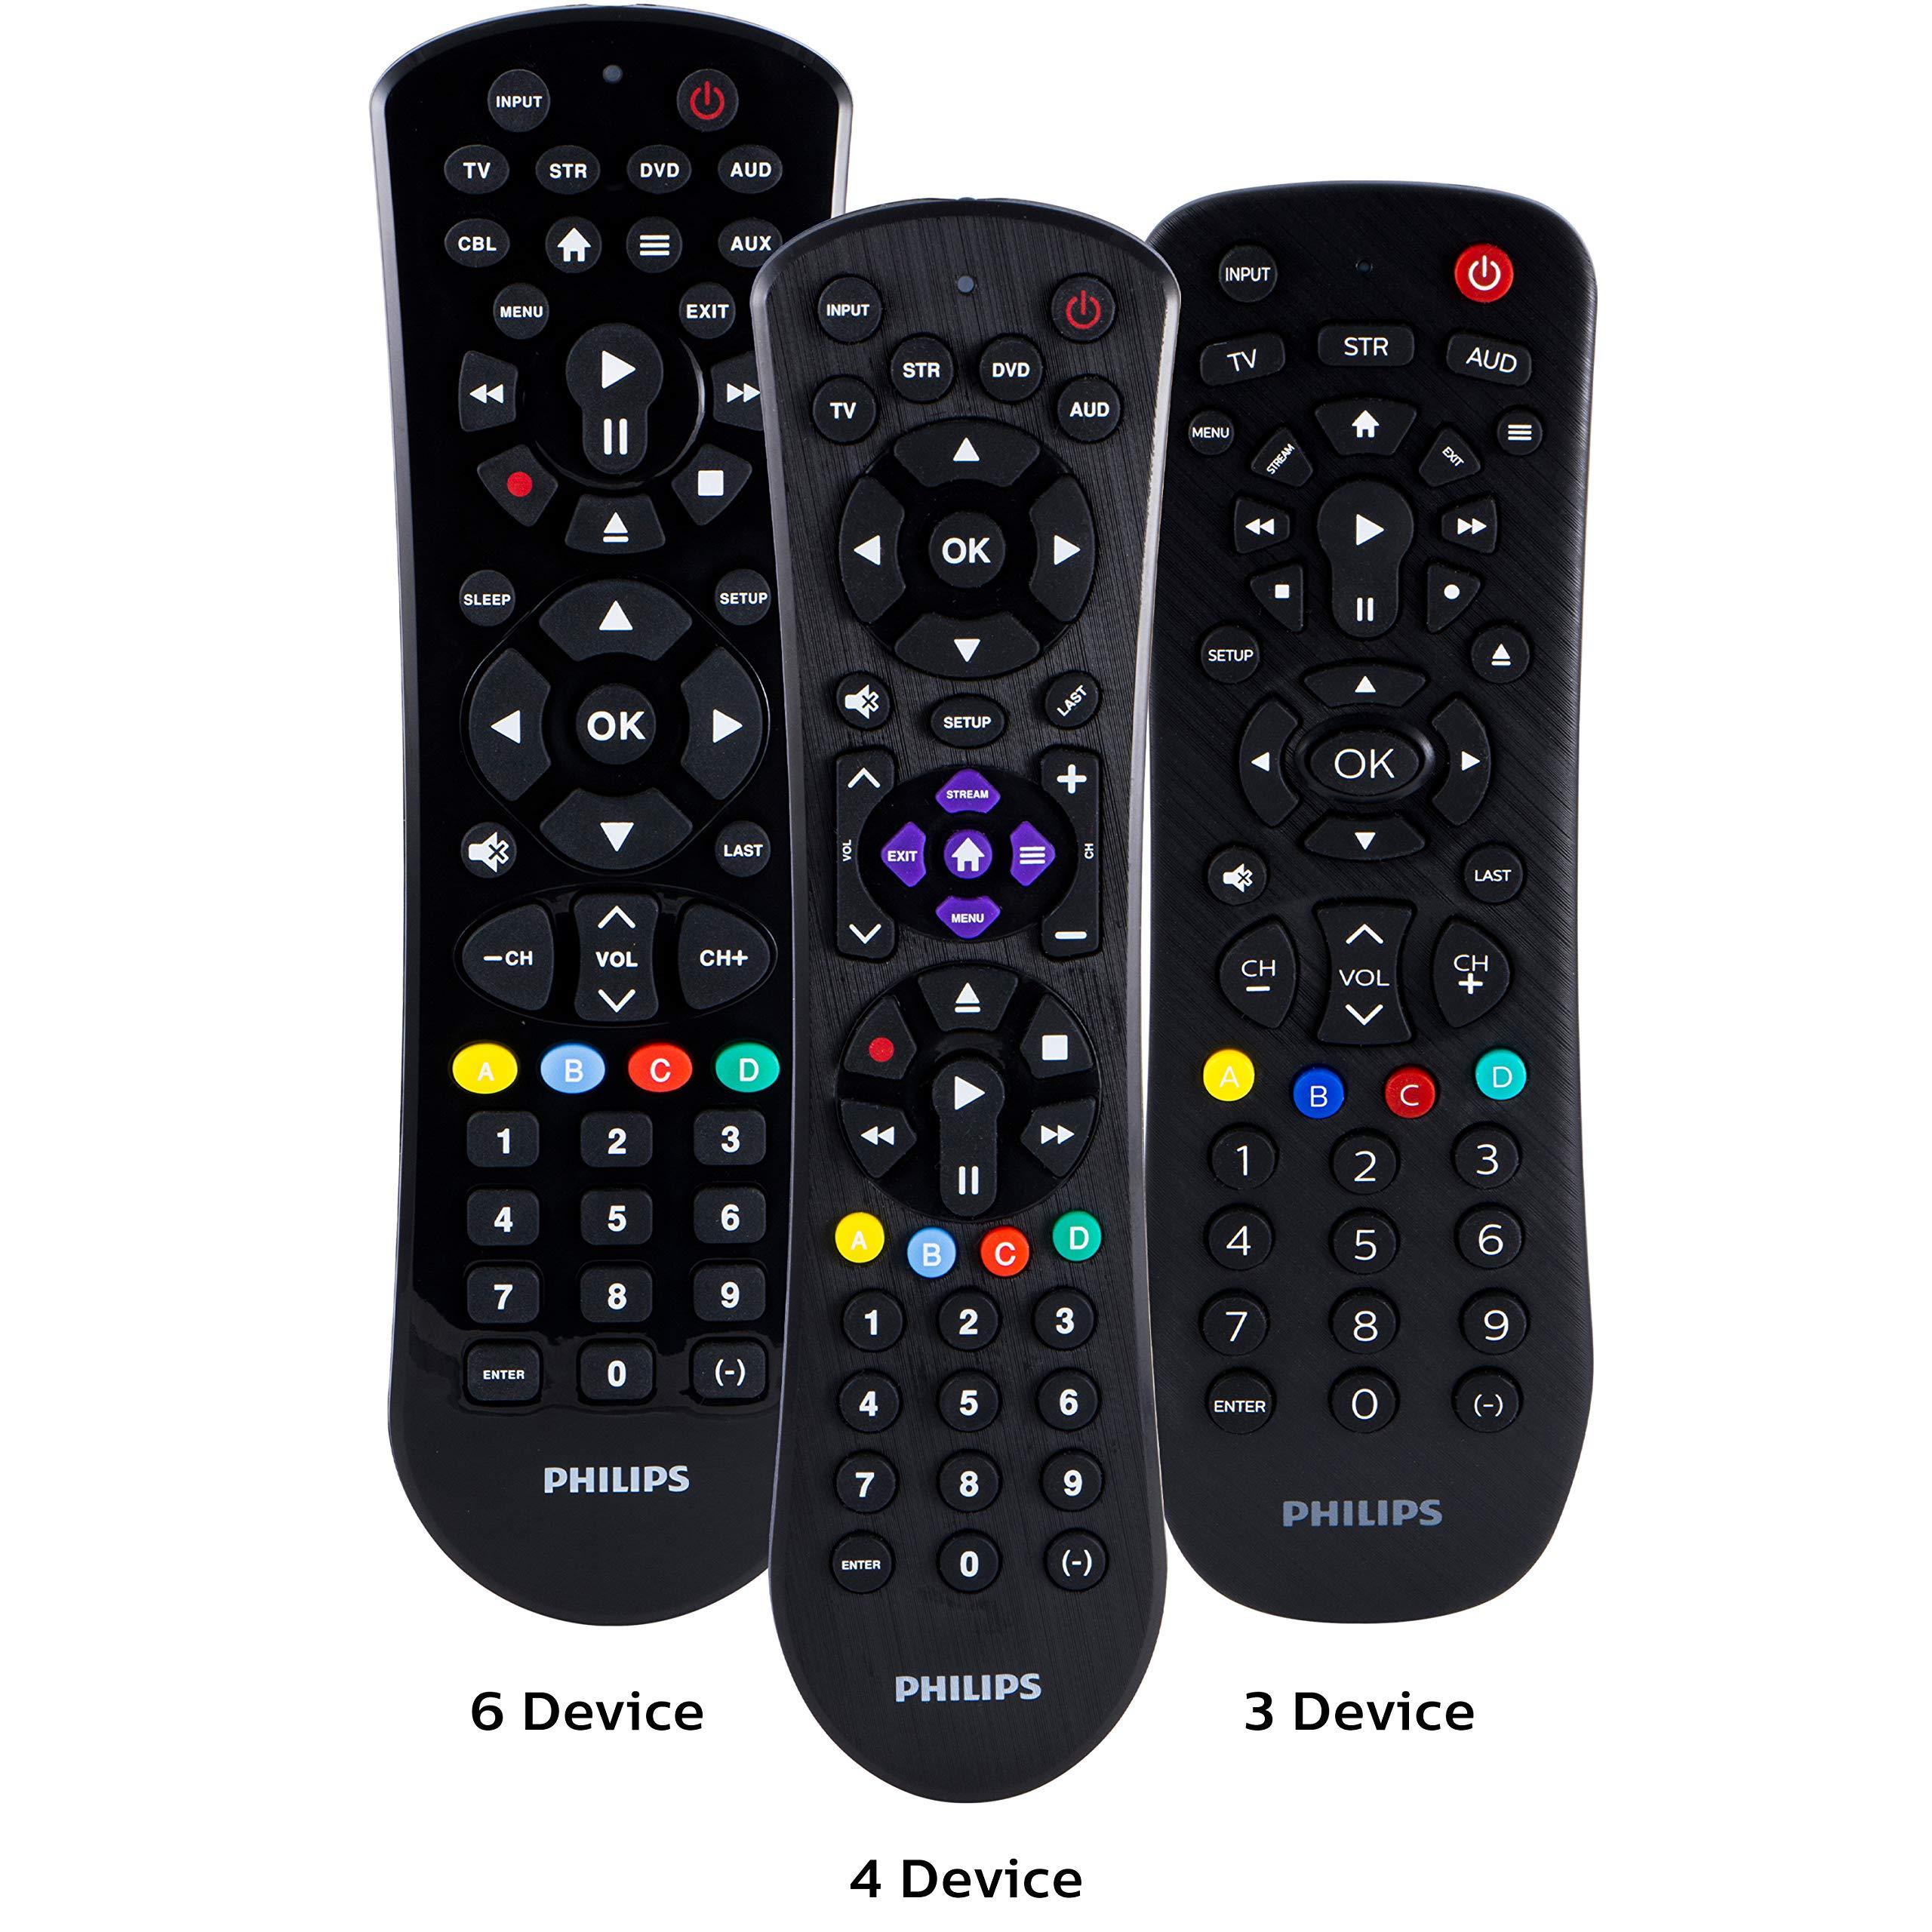 Philips Universal Remote Control for Samsung, Vizio, LG, Sony, Sharp, Roku, Apple TV, RCA, Panasonic, Smart TVs, Streaming Players, Blu-ray, DVD, Simple Setup, 4-Device, Black, SRP9243B/27 by PHILIPS